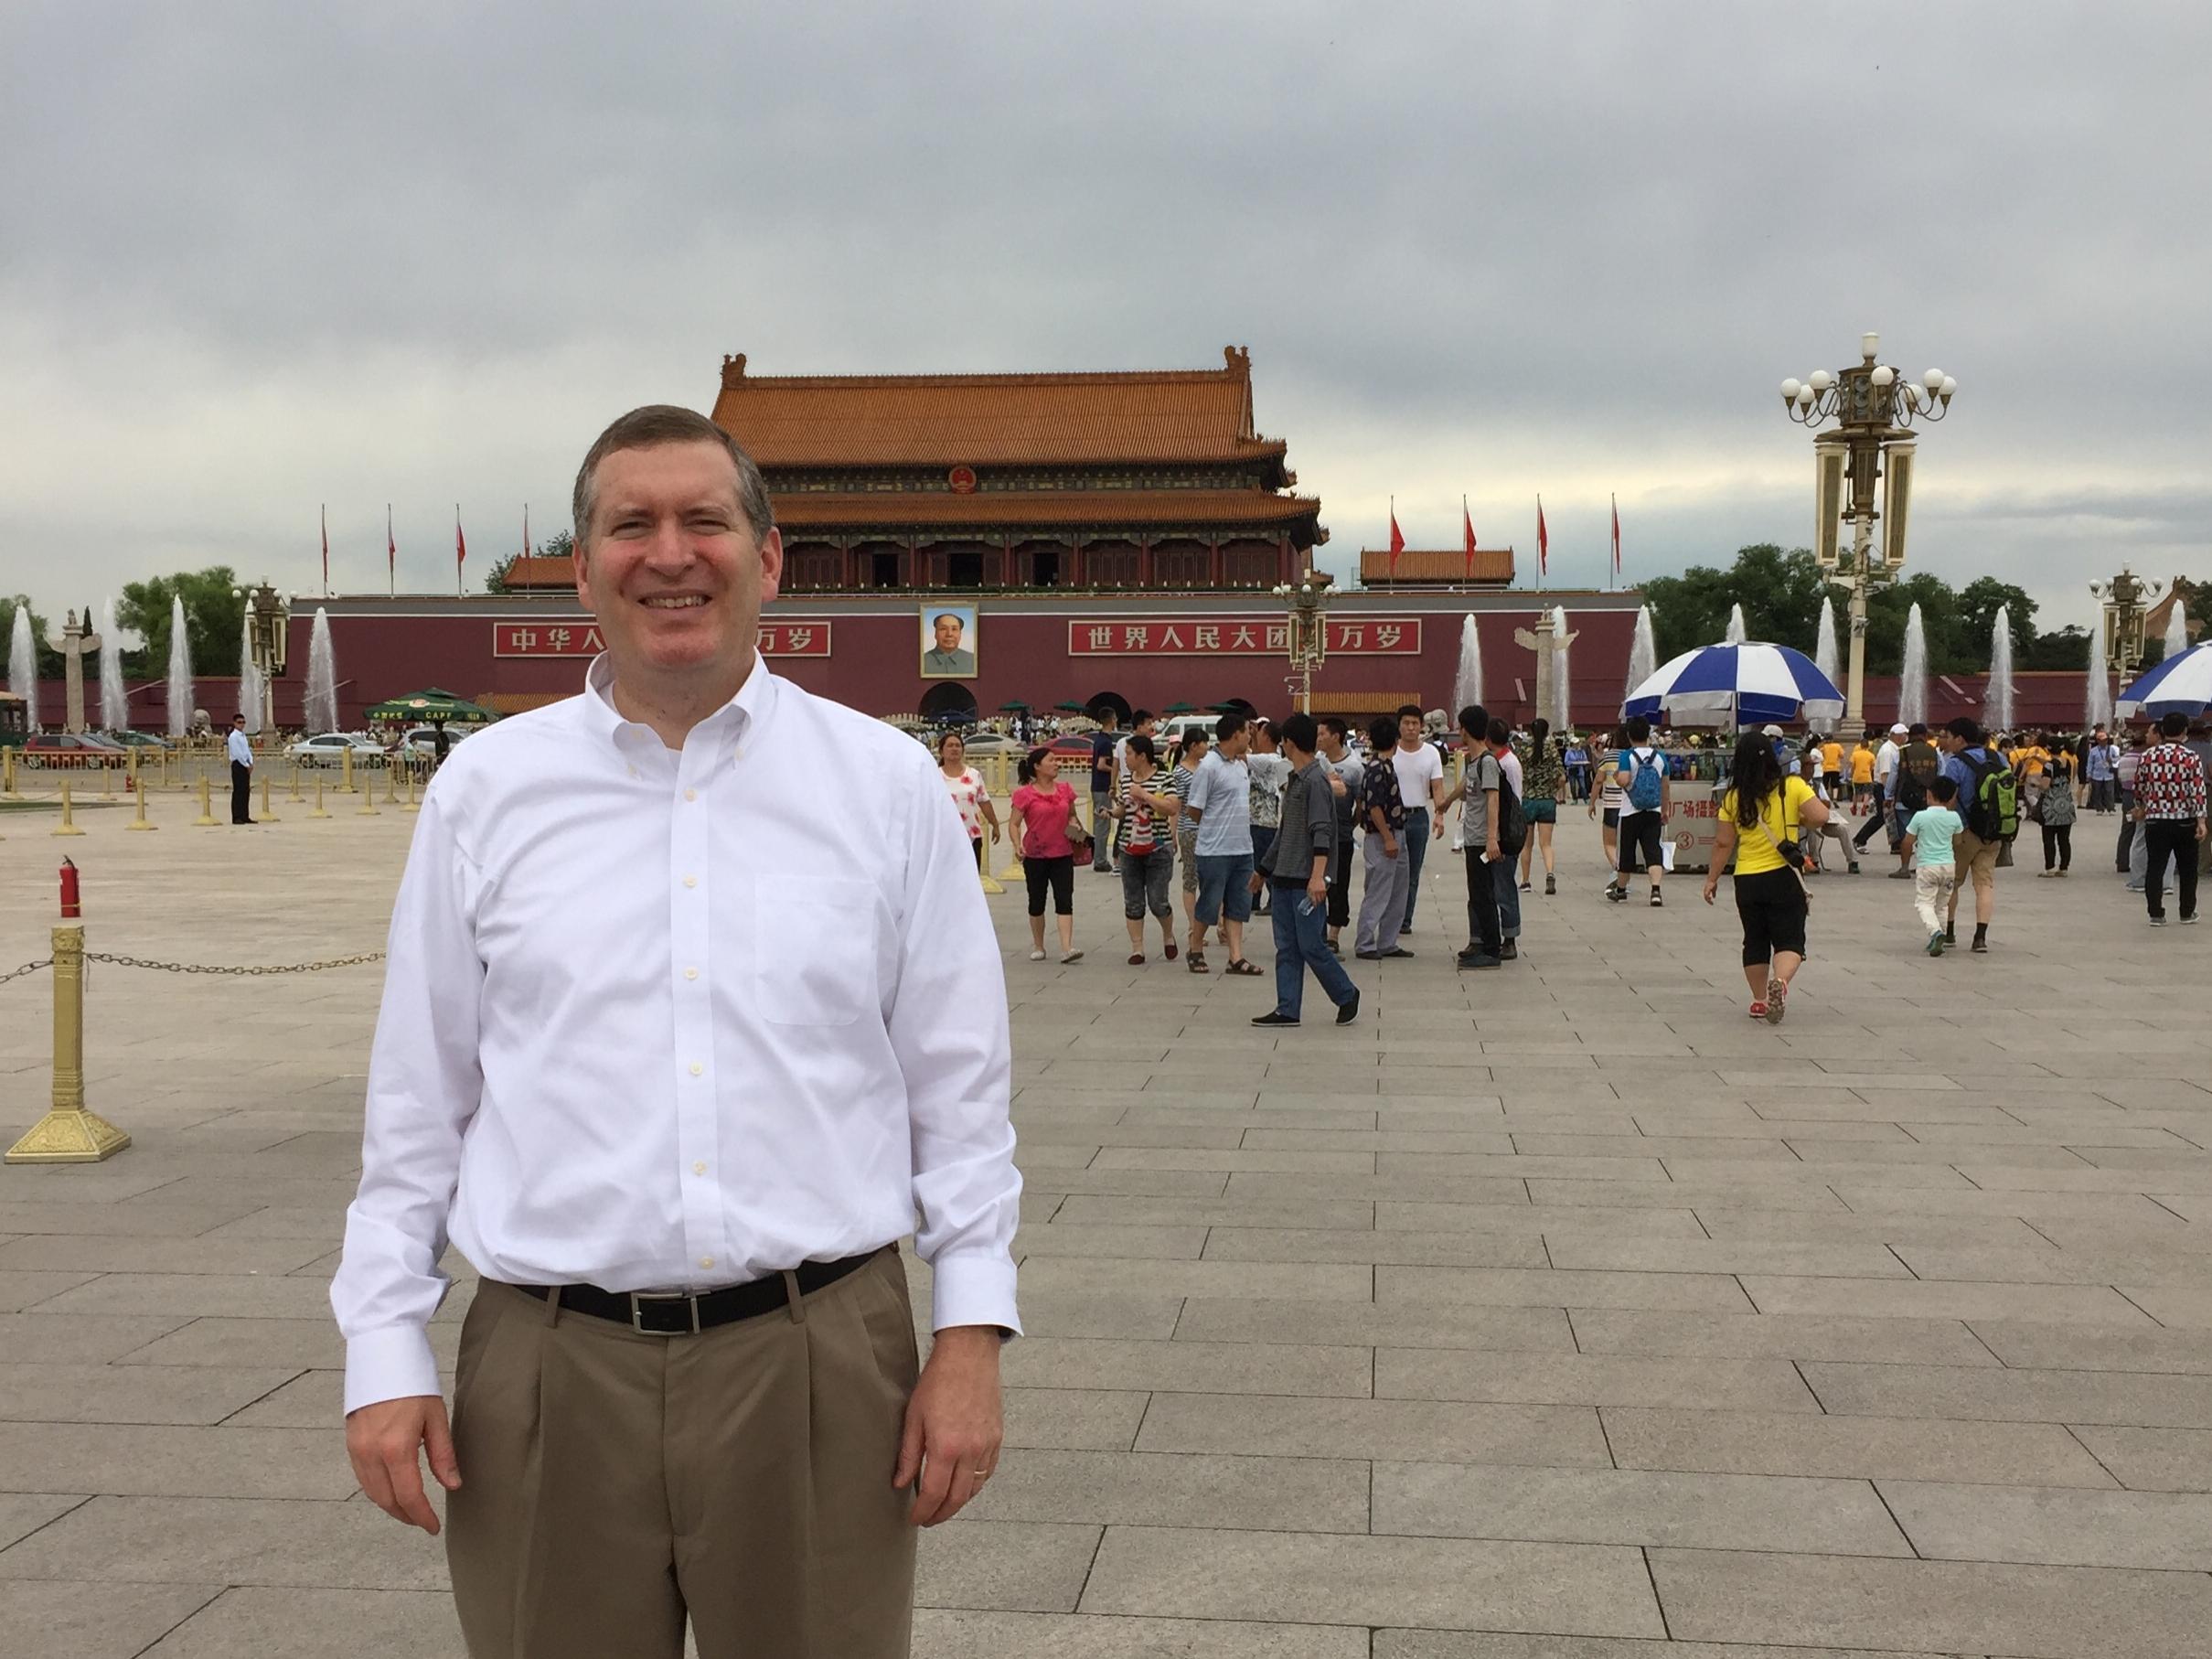 John Lunt at Tienanmen Square